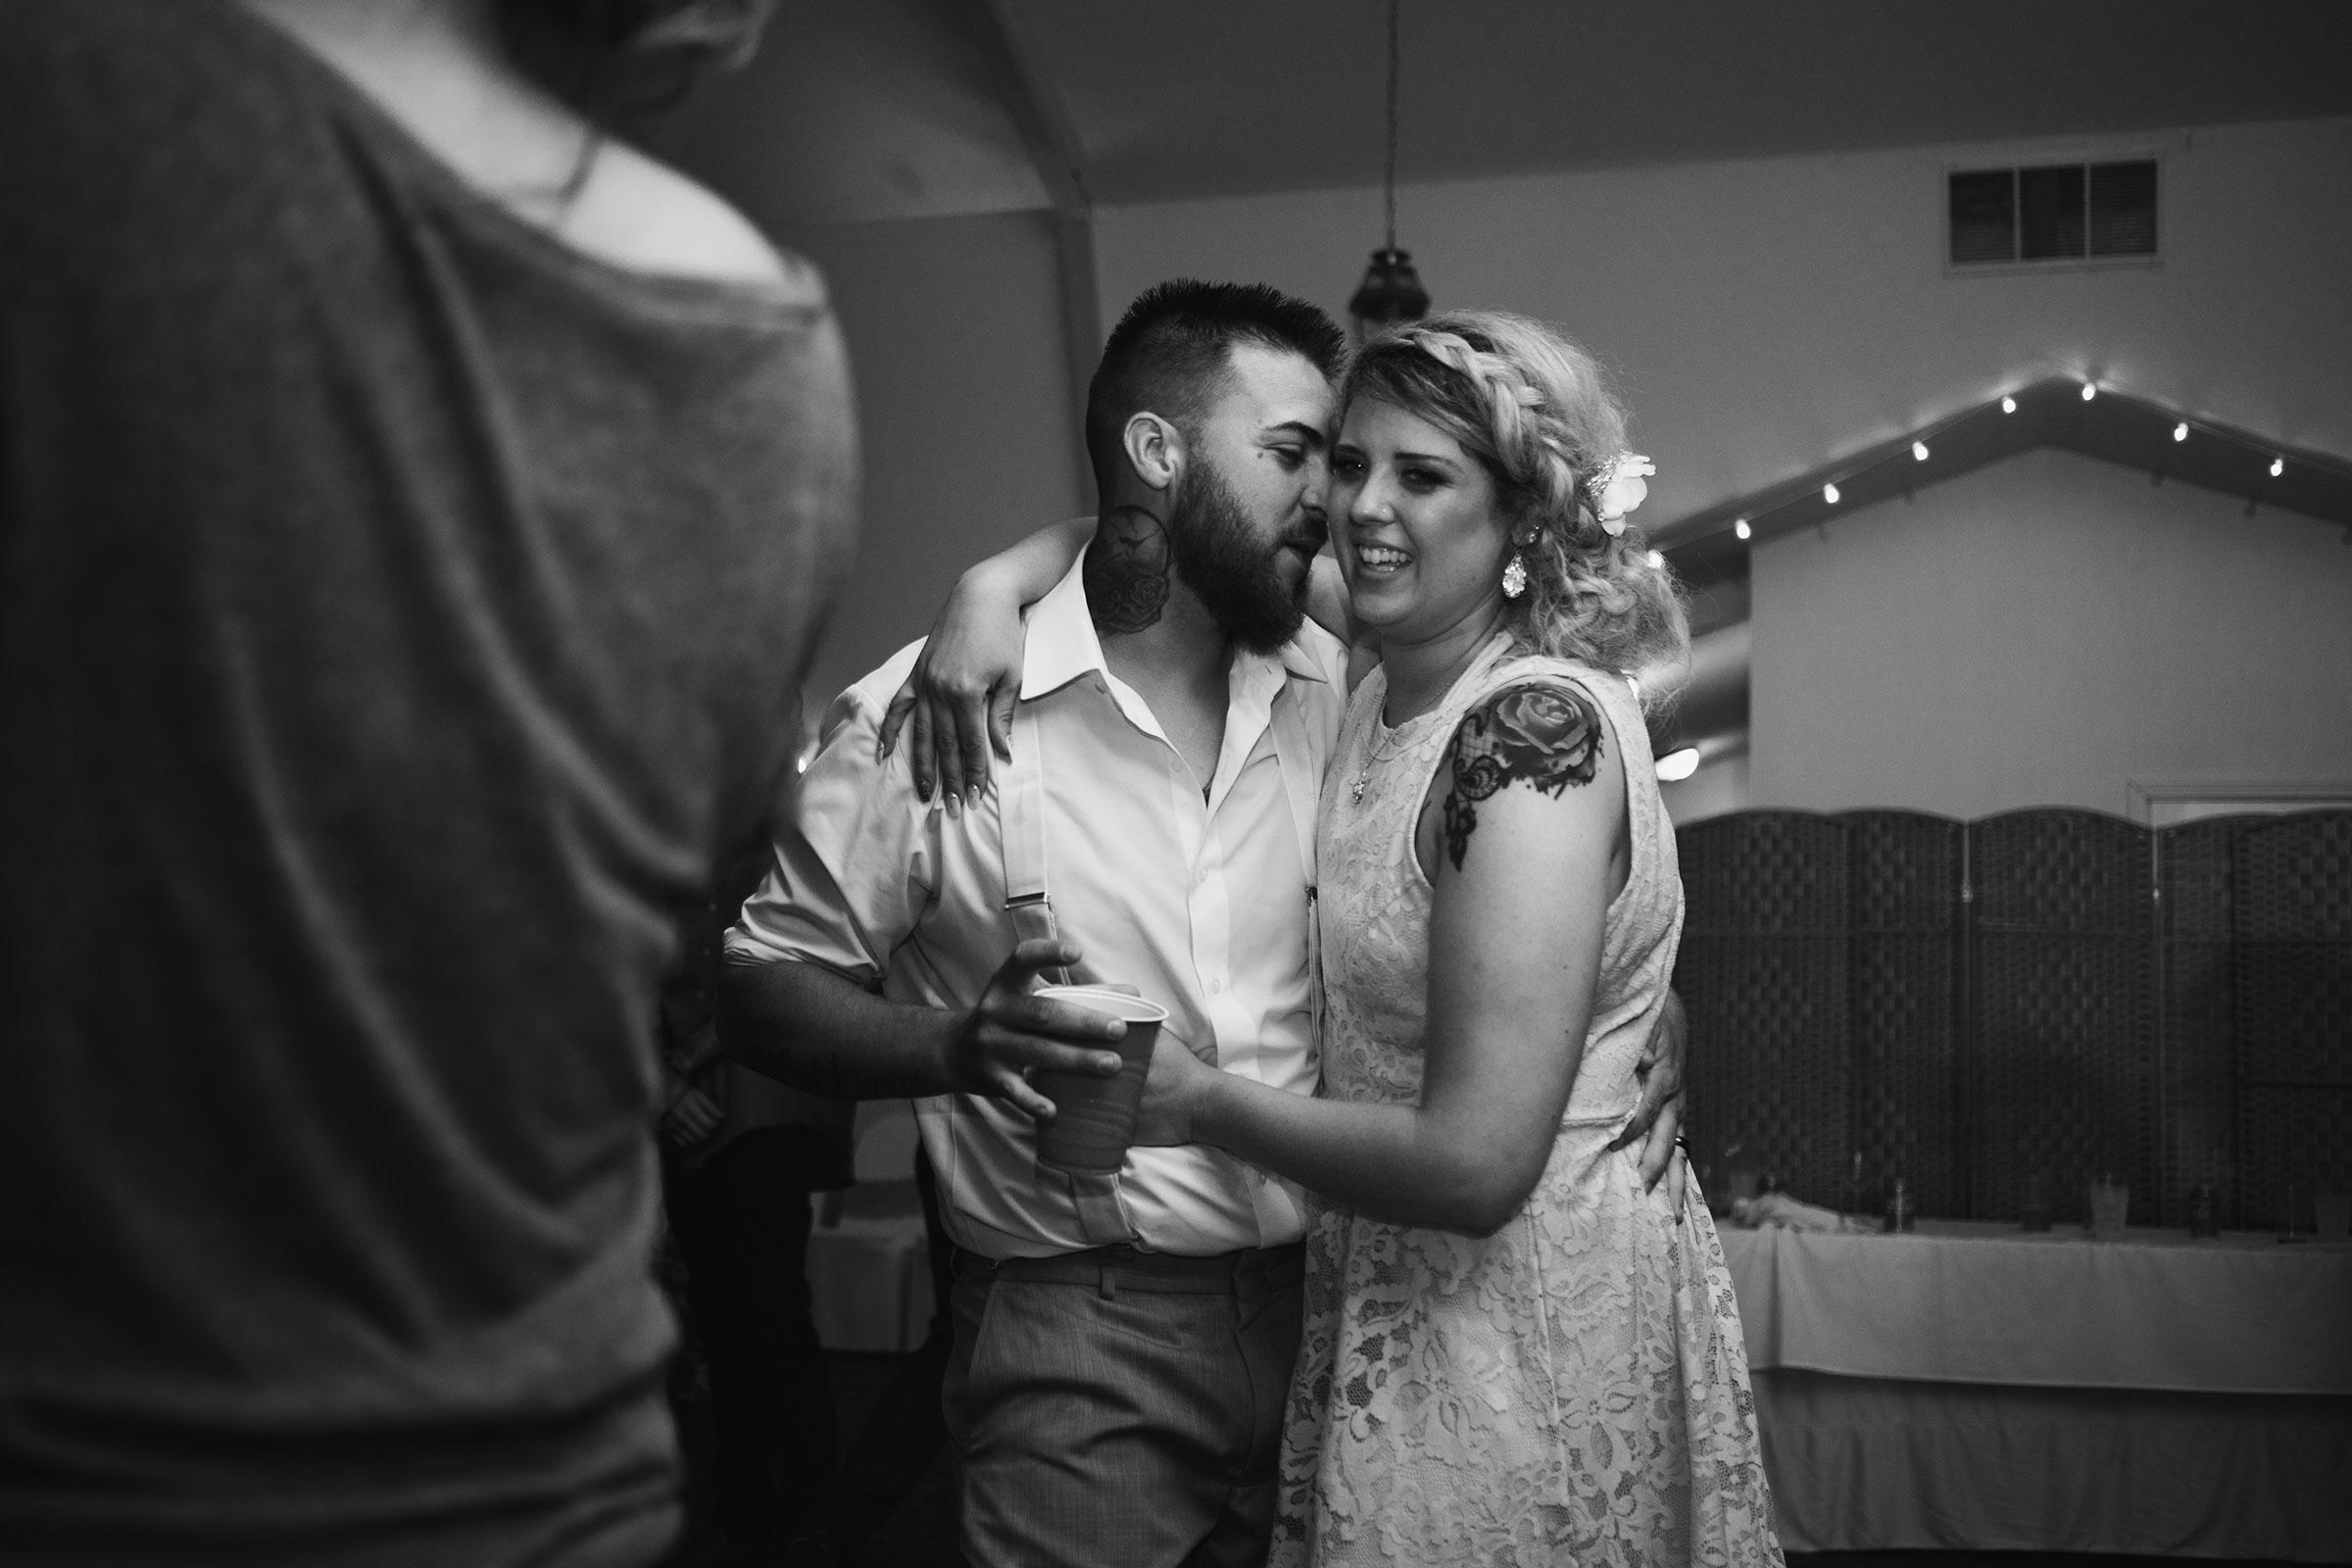 bride-groom-end-of-night-dancing-wedding-summerset-winery-indianola-iowa-raelyn-ramey-photography.jpg